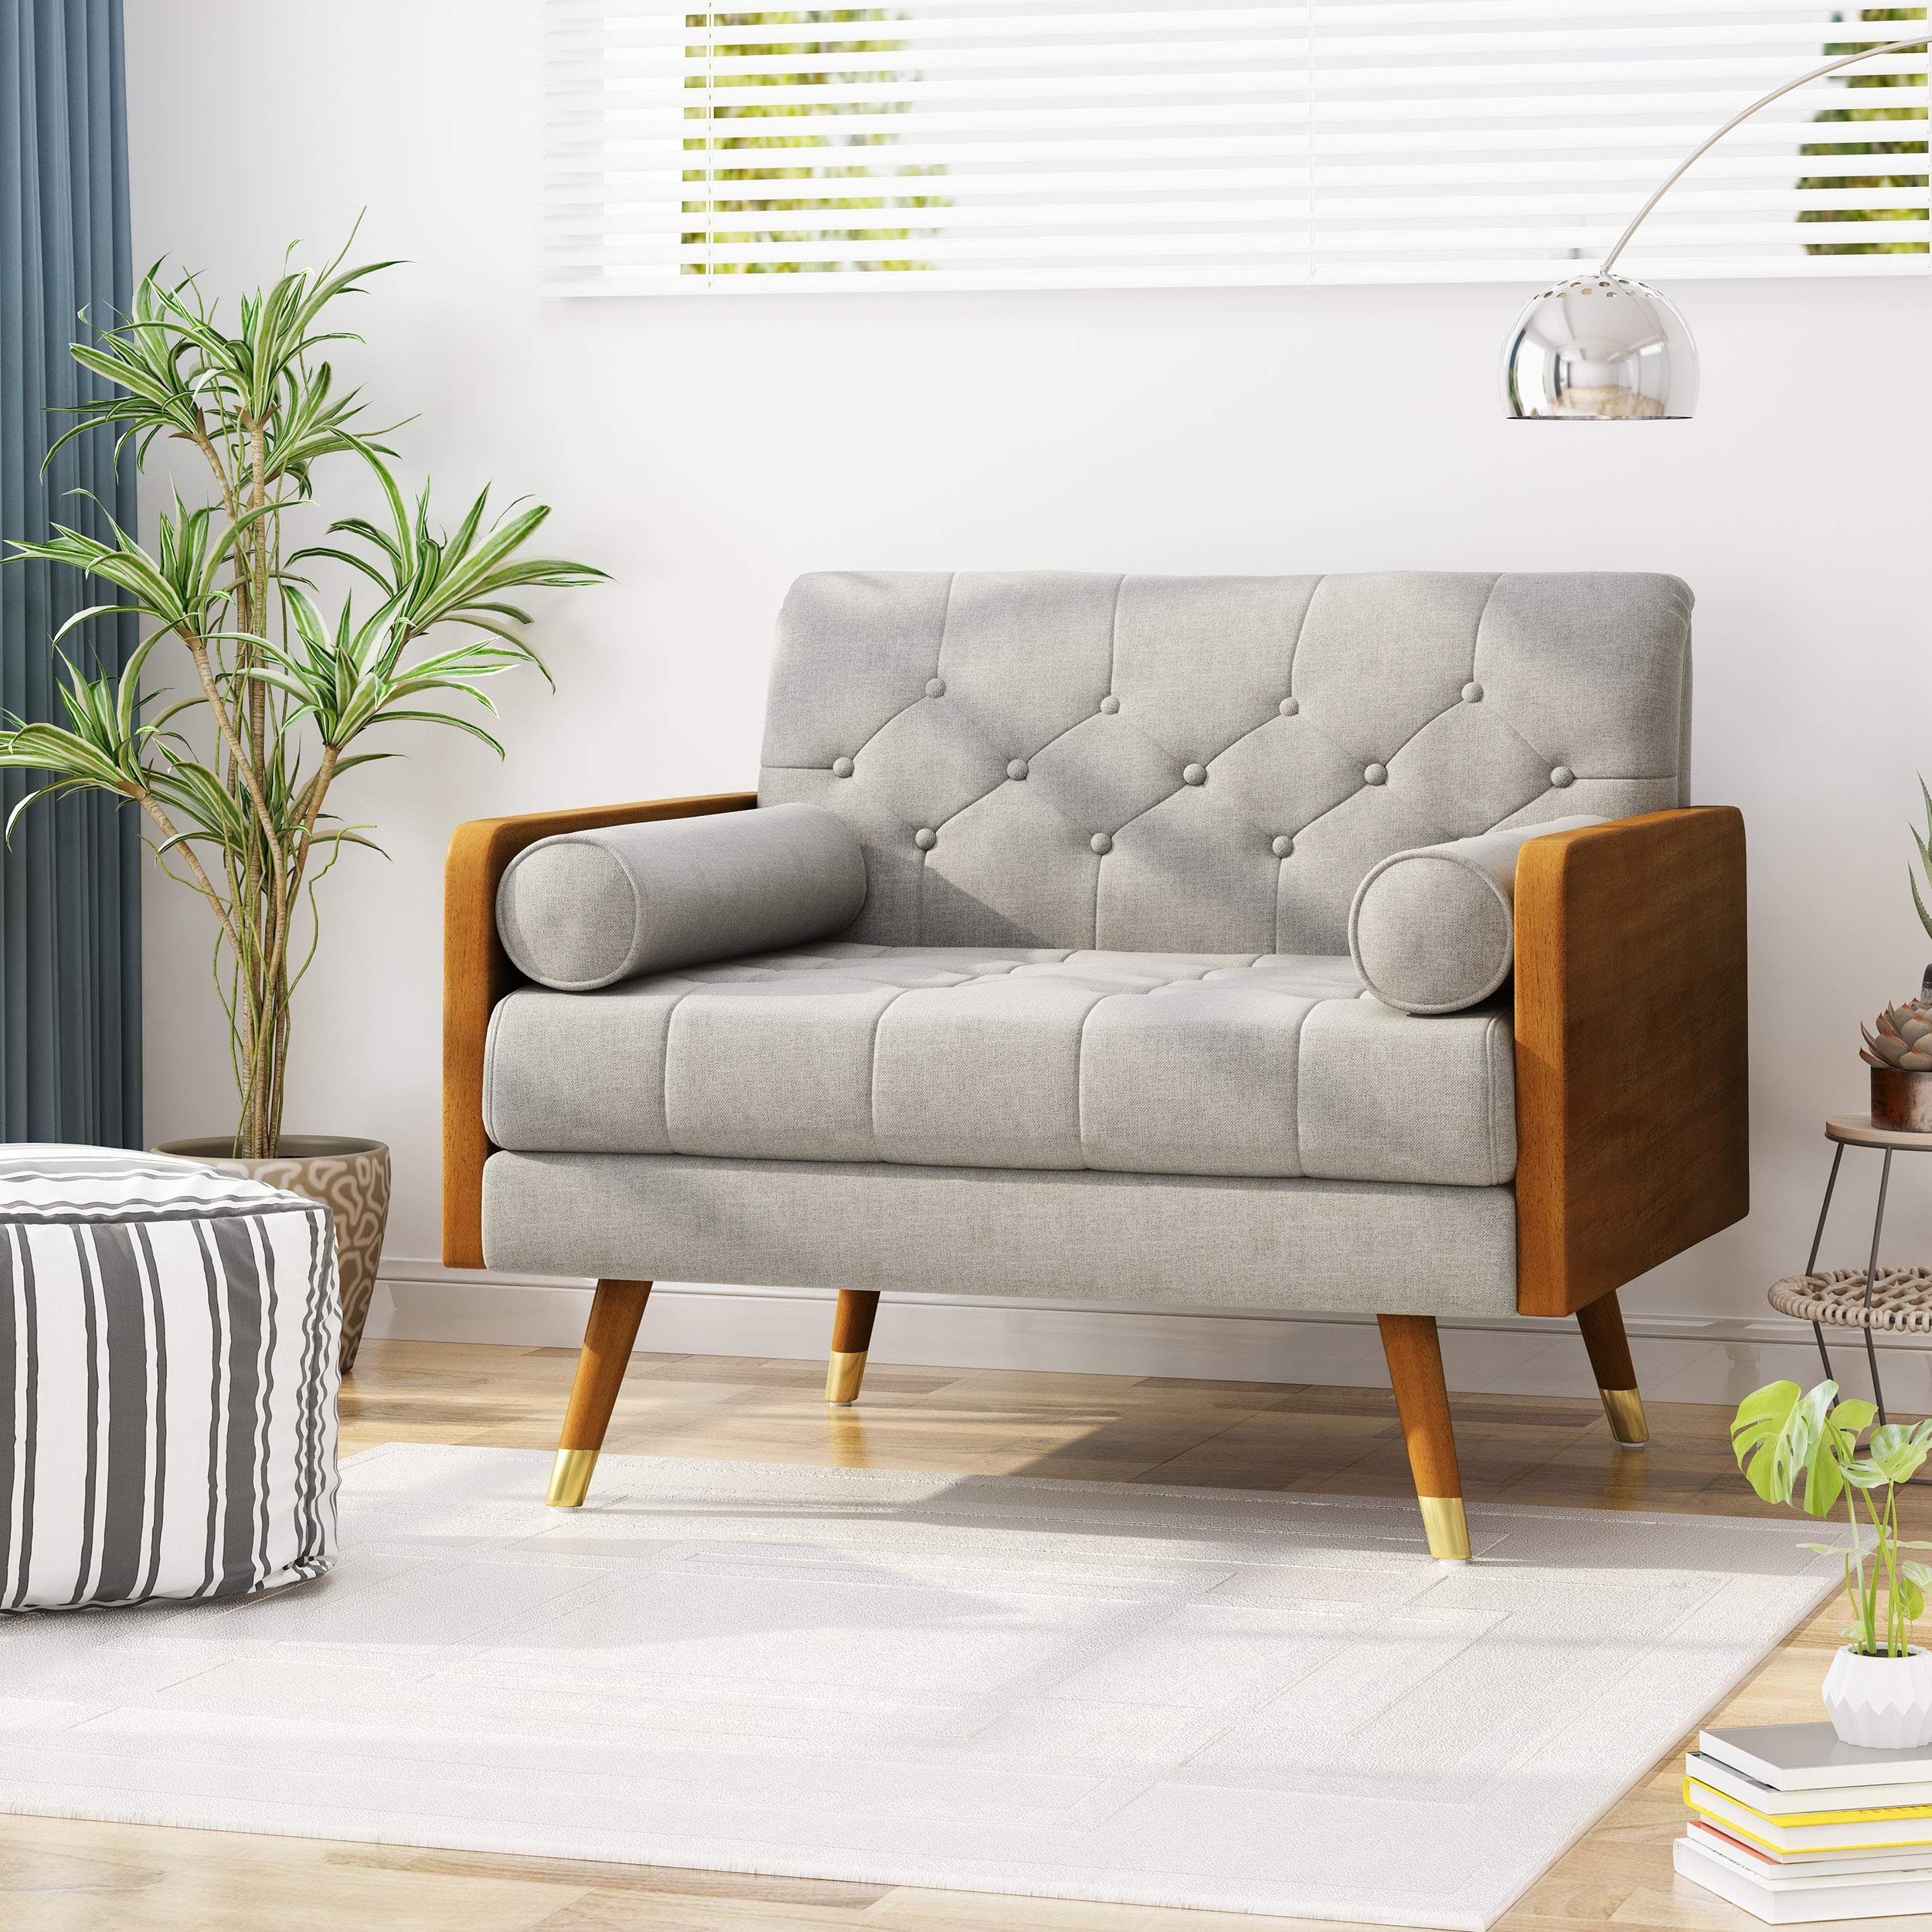 Christopher Knight Home Greta Mid Century Modern Fabric Club Chair, Beige, Dark Walnut by Christopher Knight Home